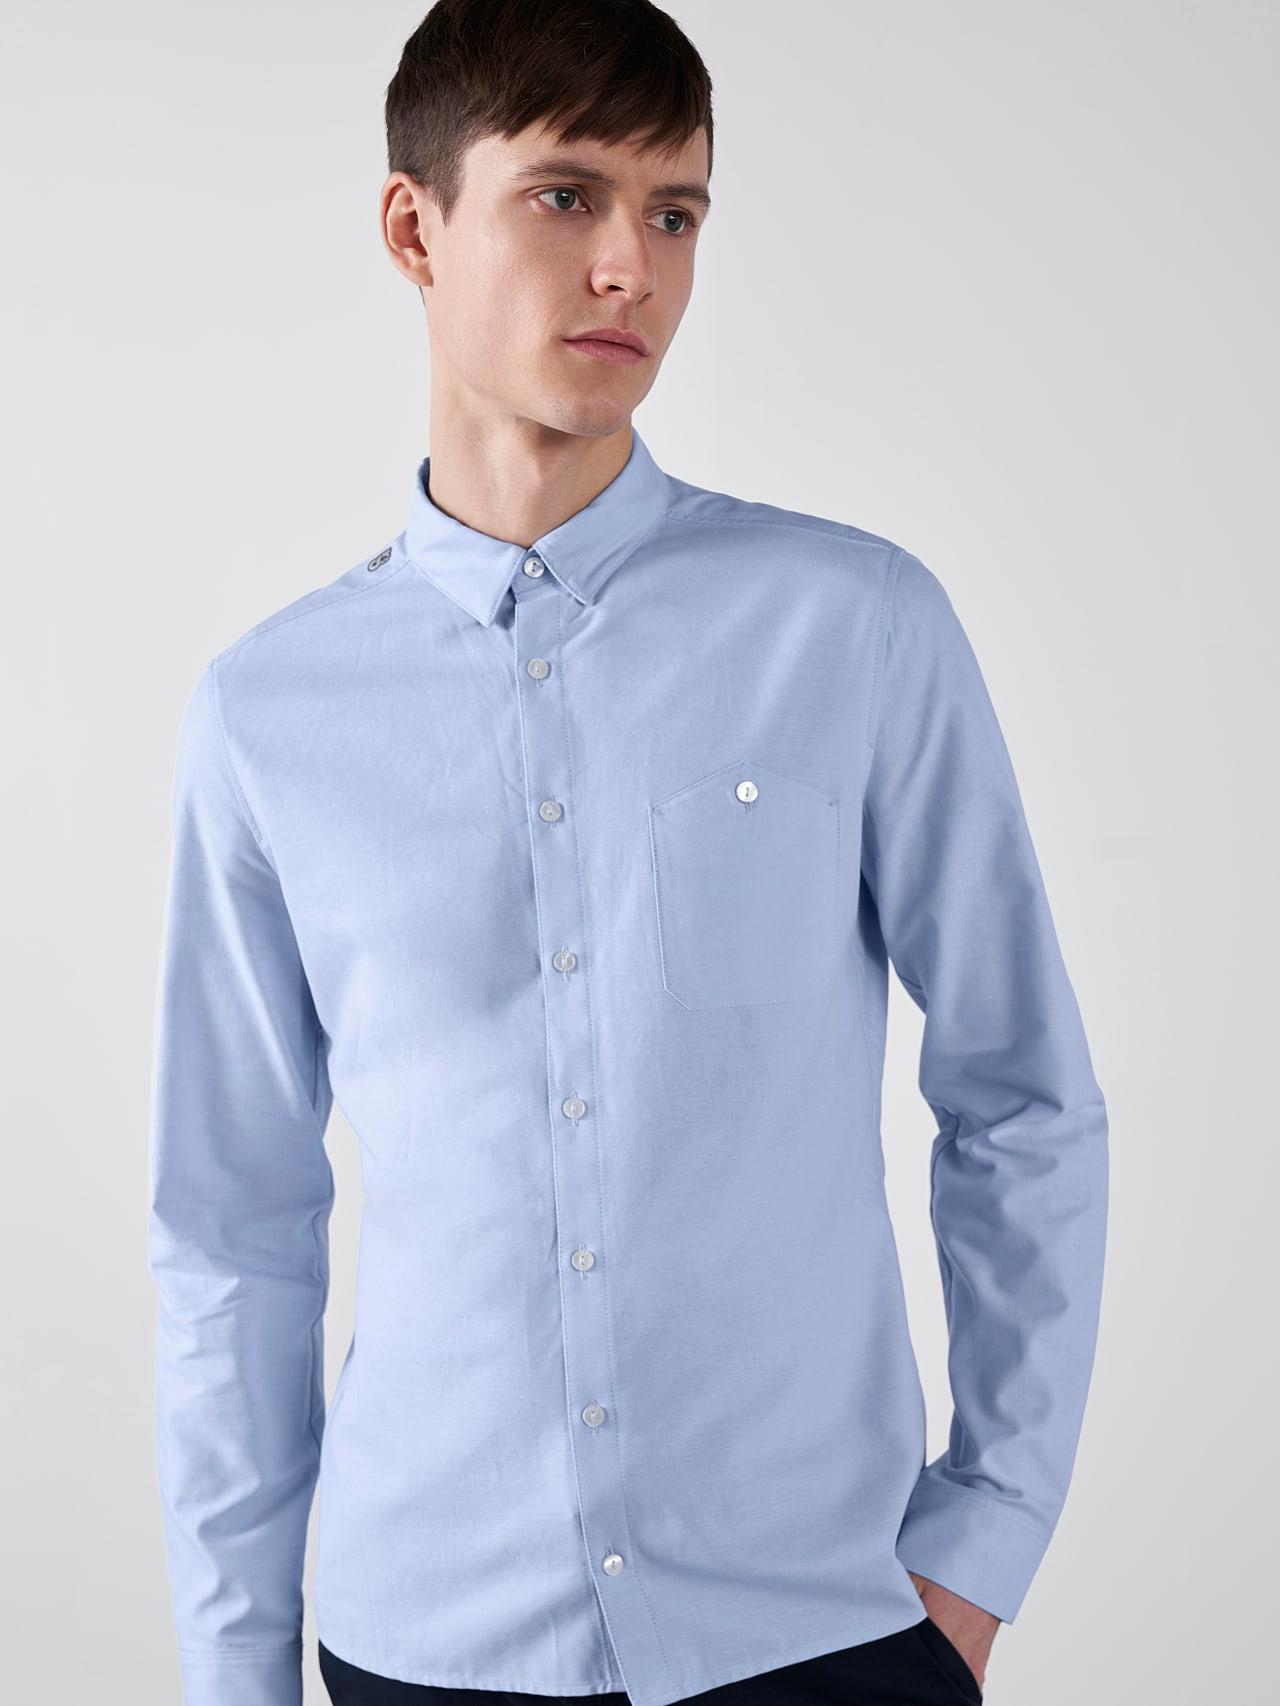 WOSKA V2.Y5.01 Kent Collar Oxford Shirt light blue Right Alpha Tauri